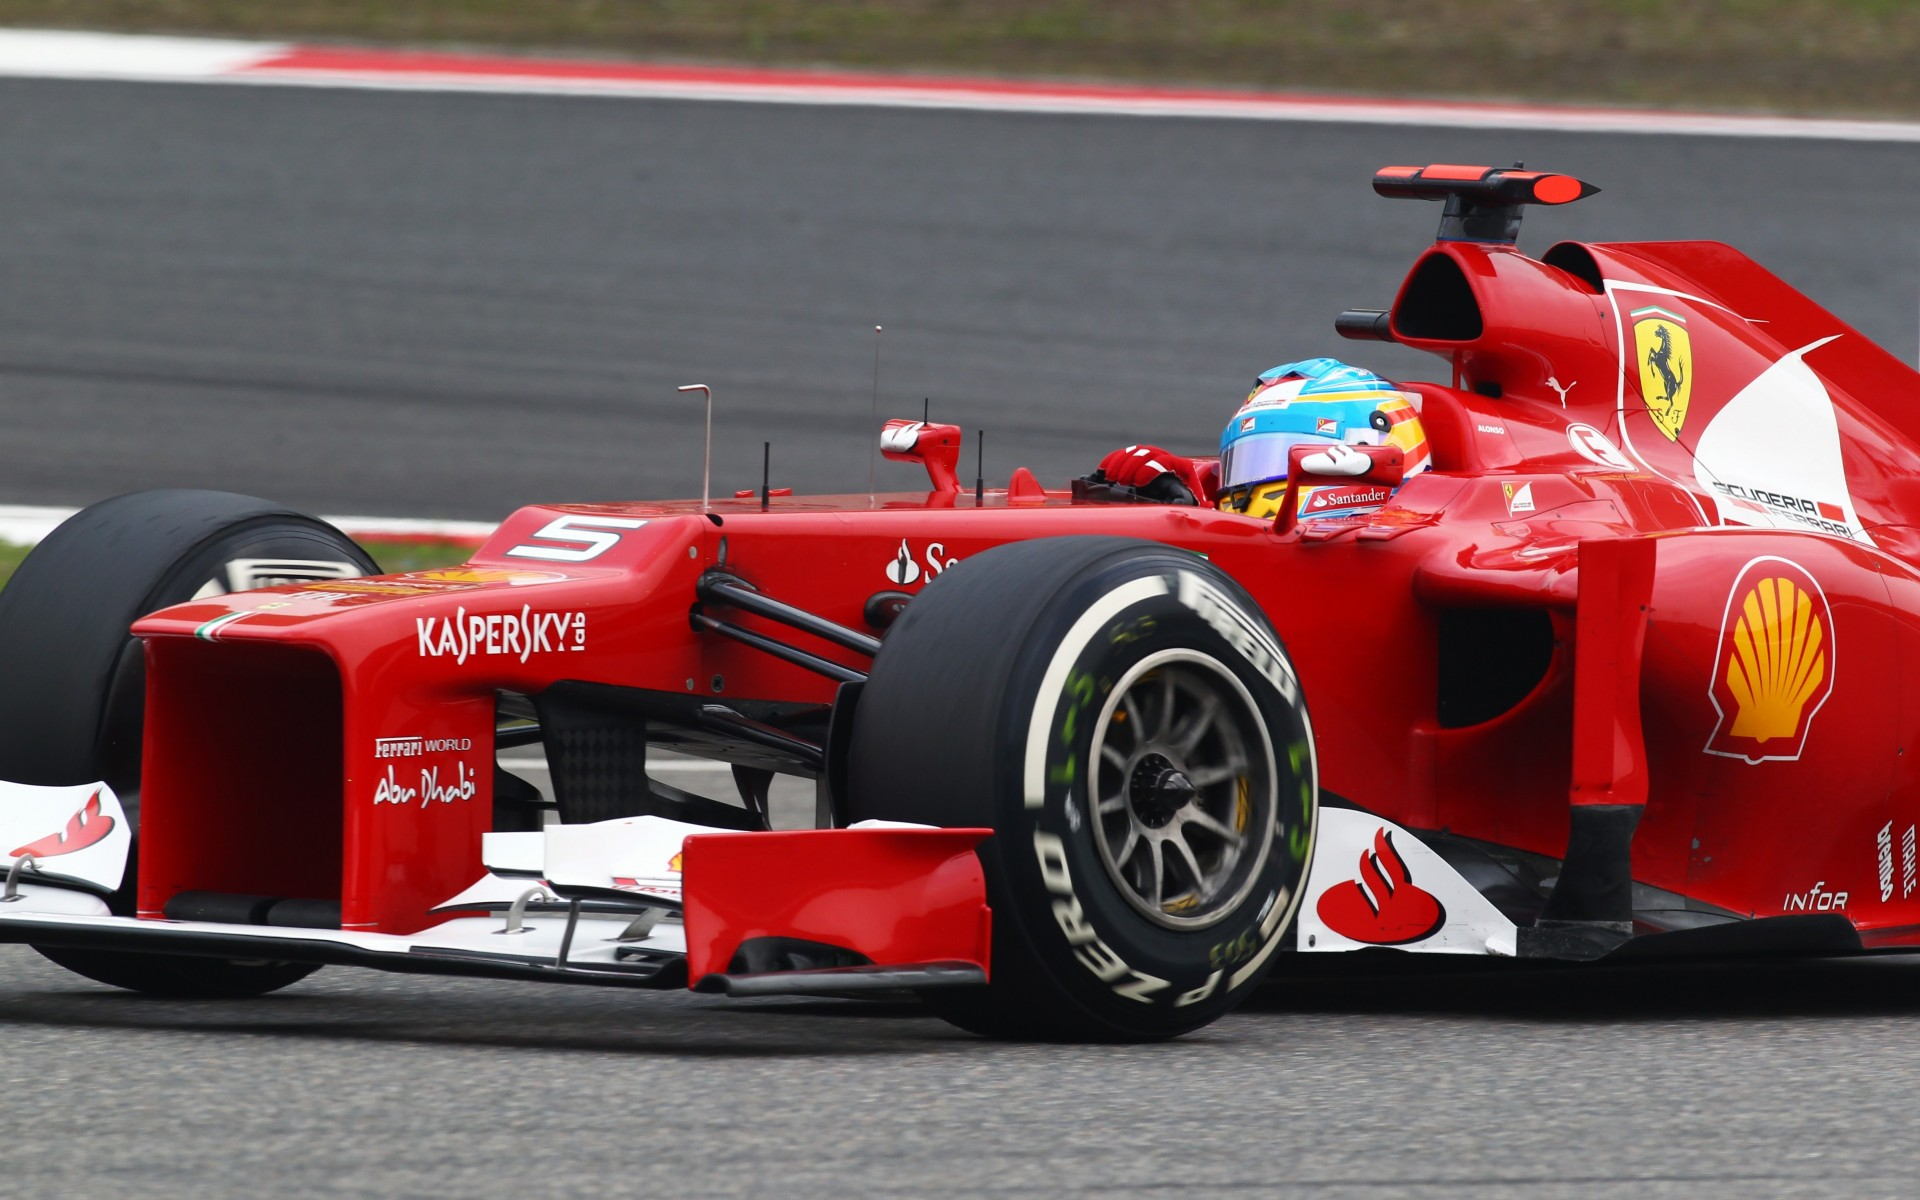 Ferrari F1 Fernando Alonso Formula-1 wallpaper background